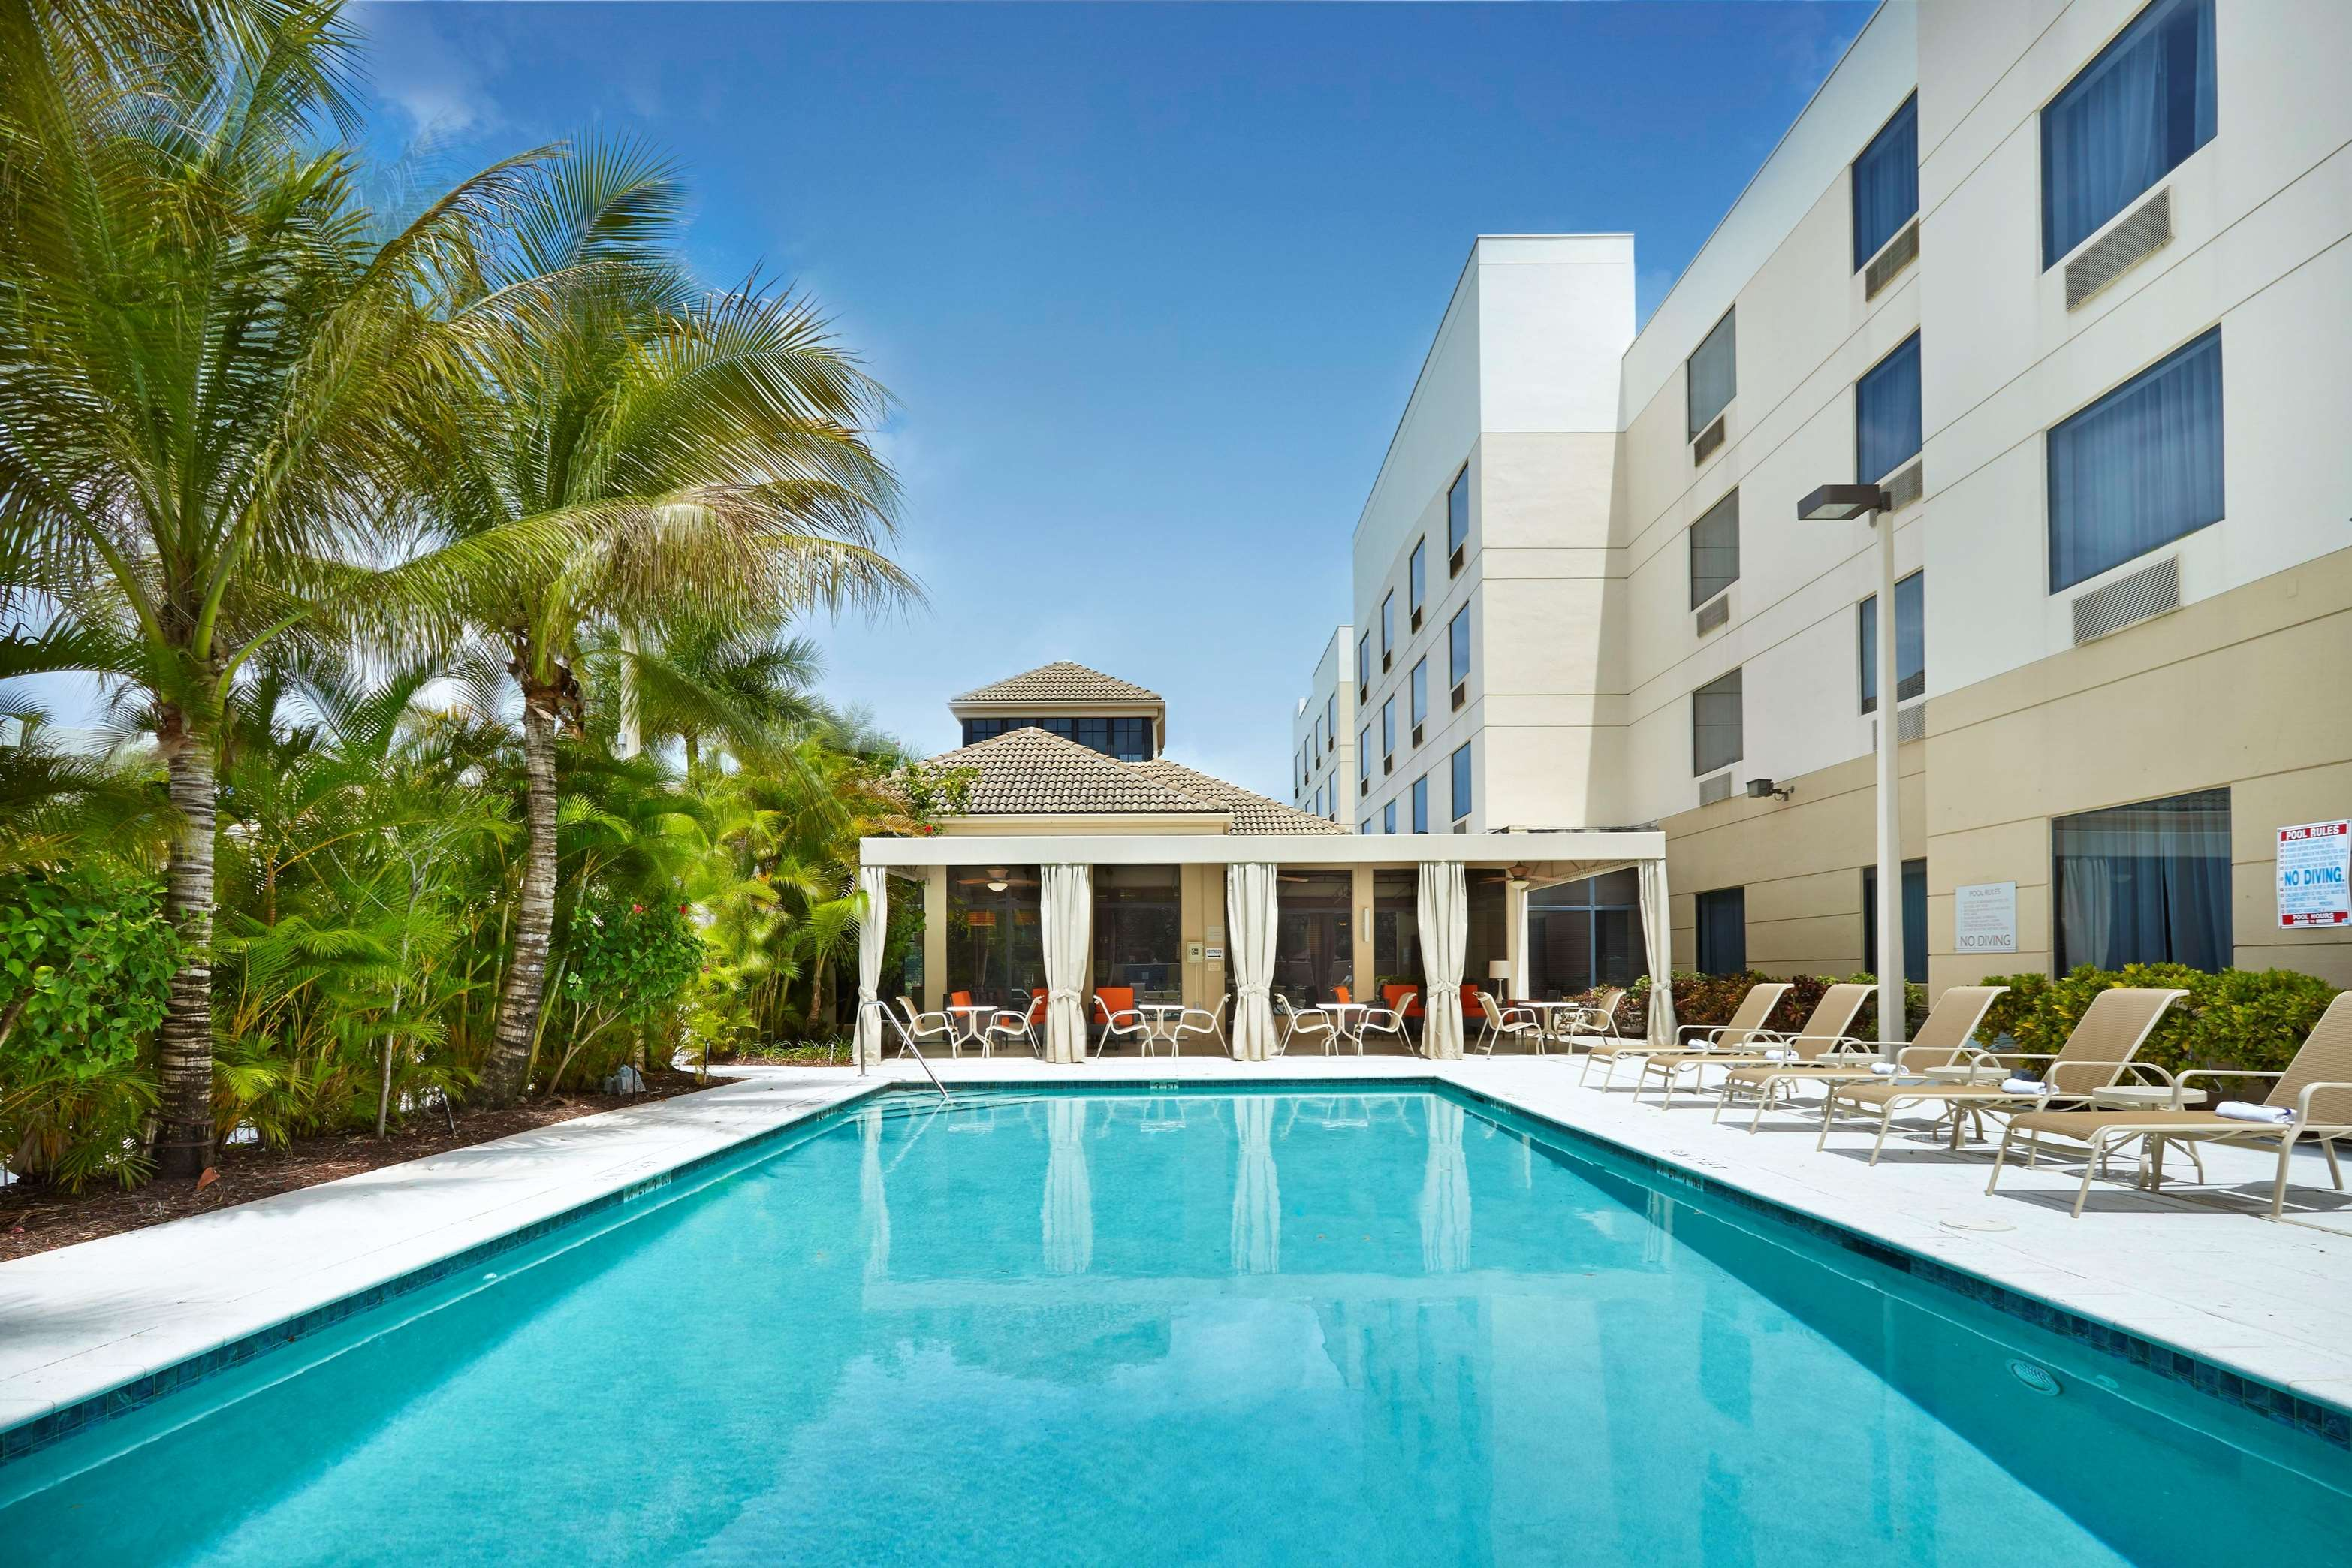 West Palm Beach Hotels Near Airport